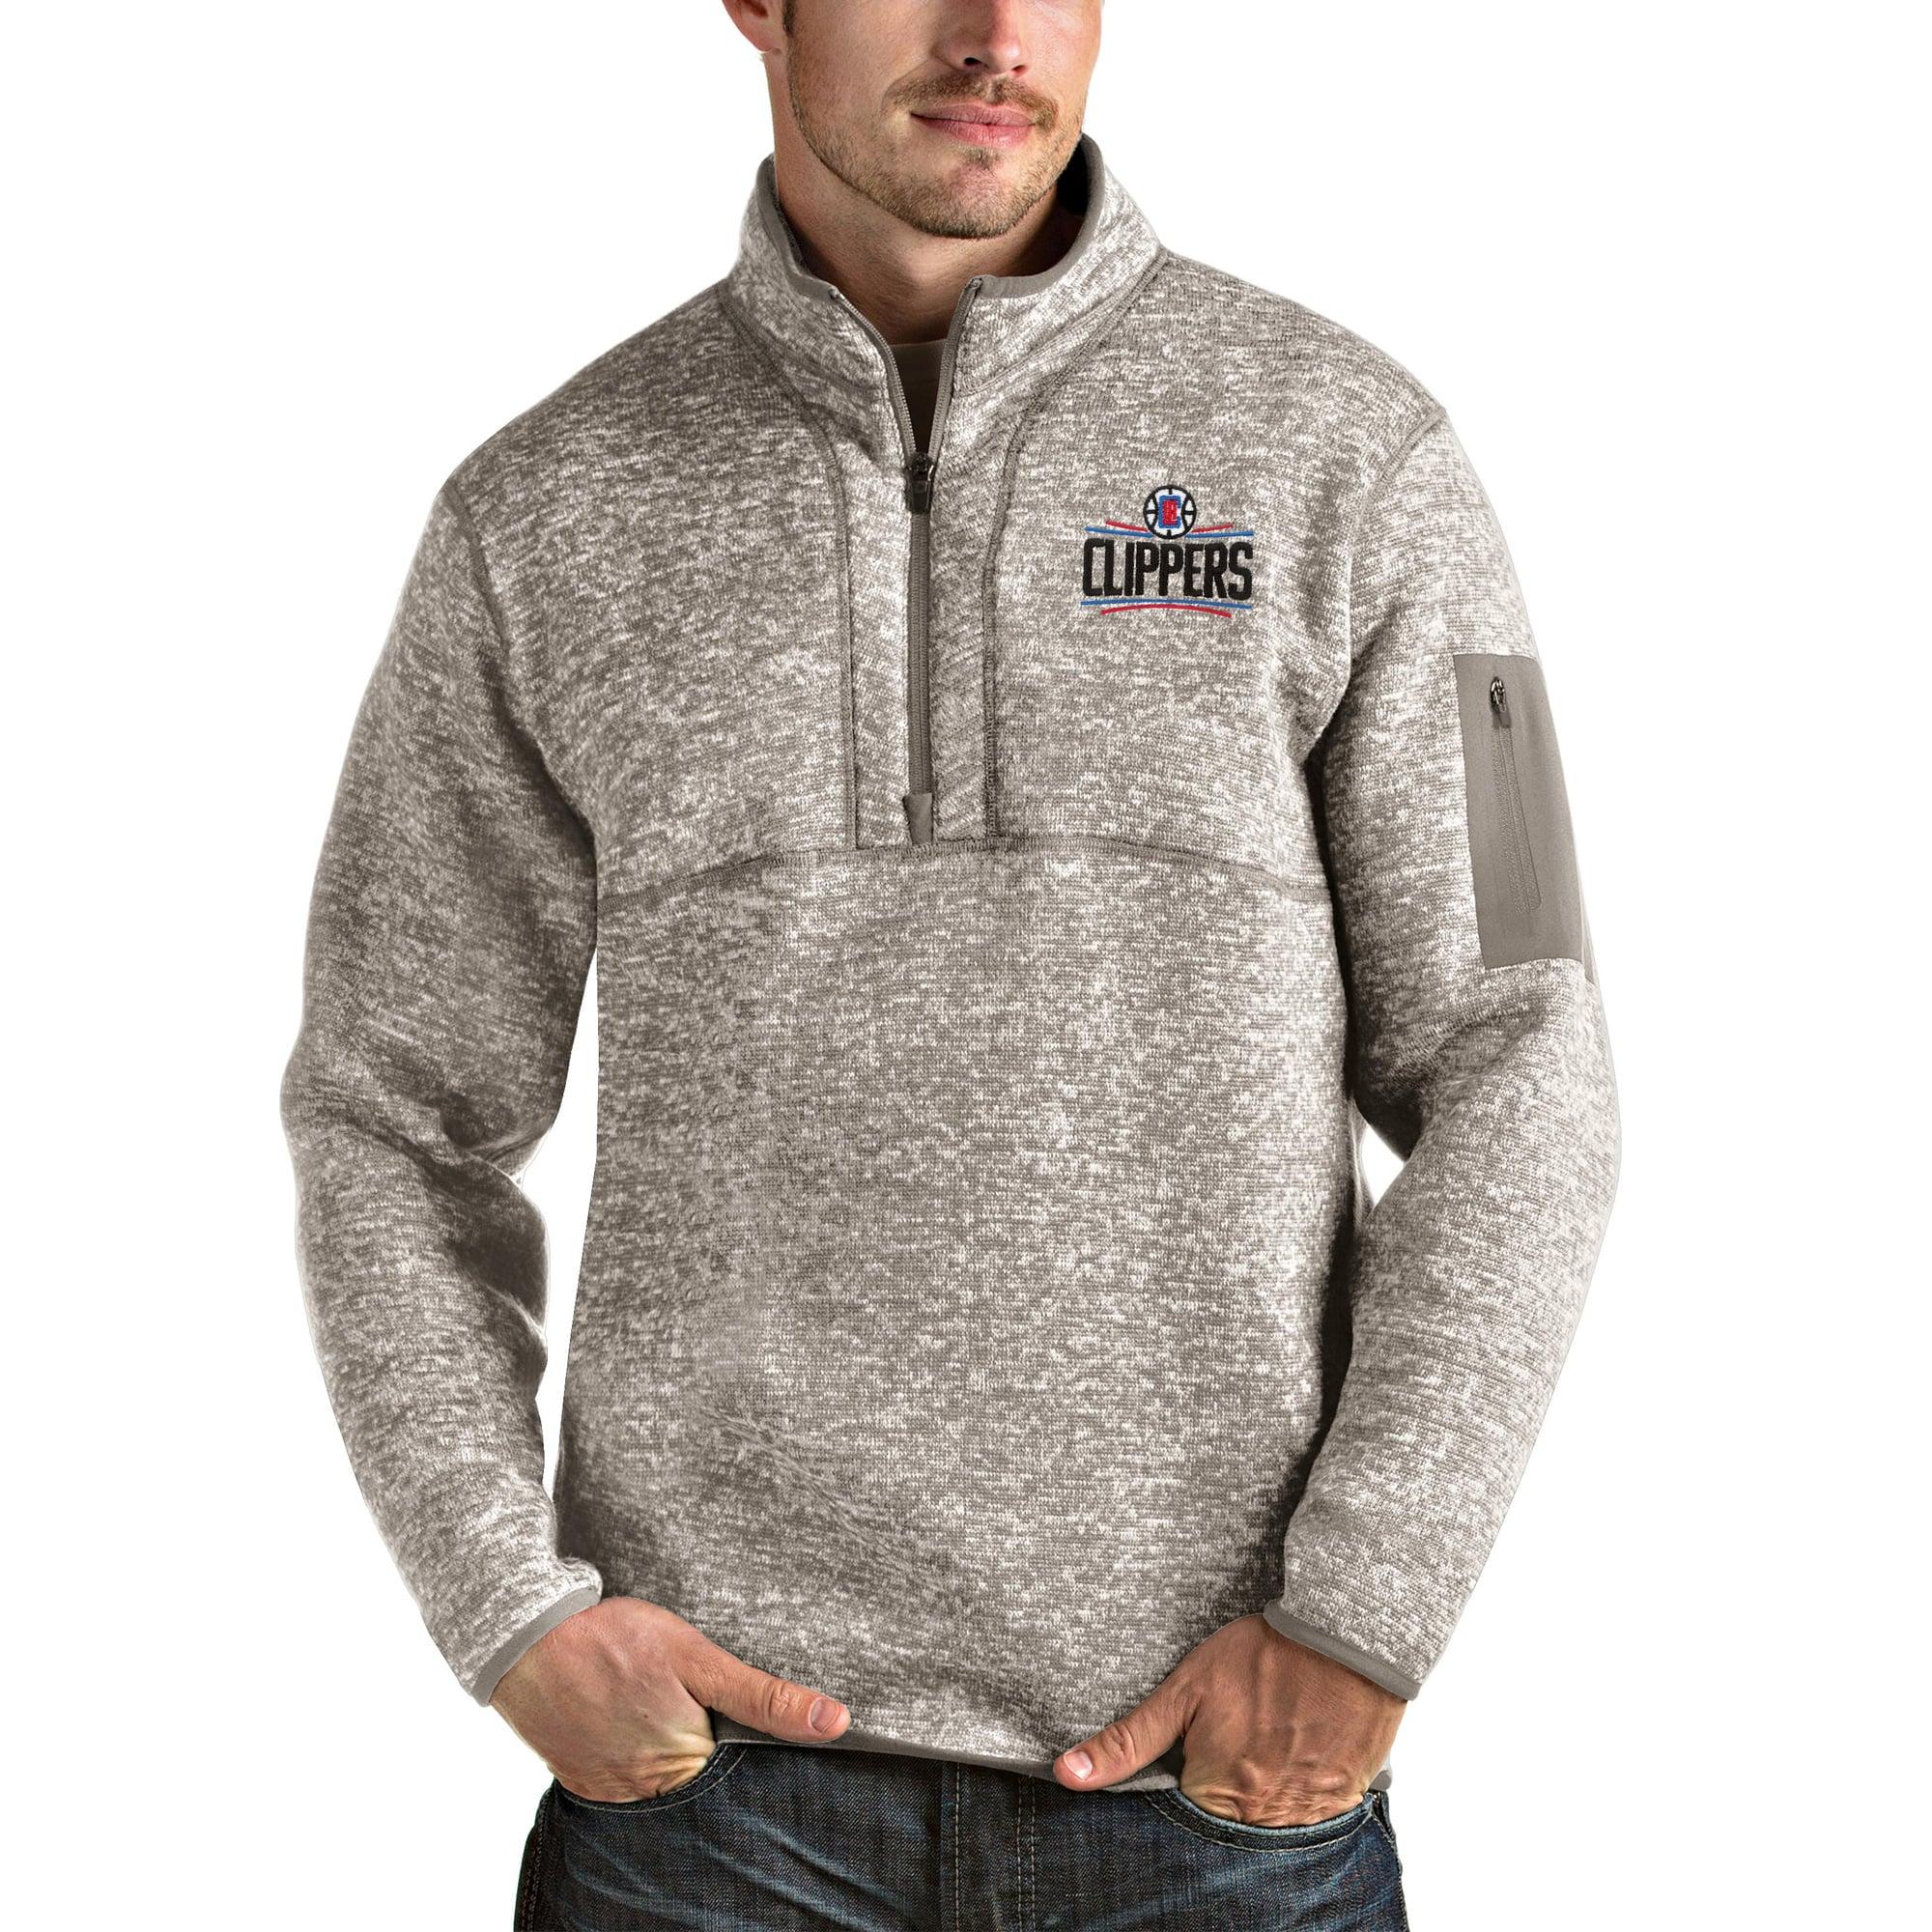 LA Clippers Antigua Fortune Quarter-Zip Pullover Jacket - Natural